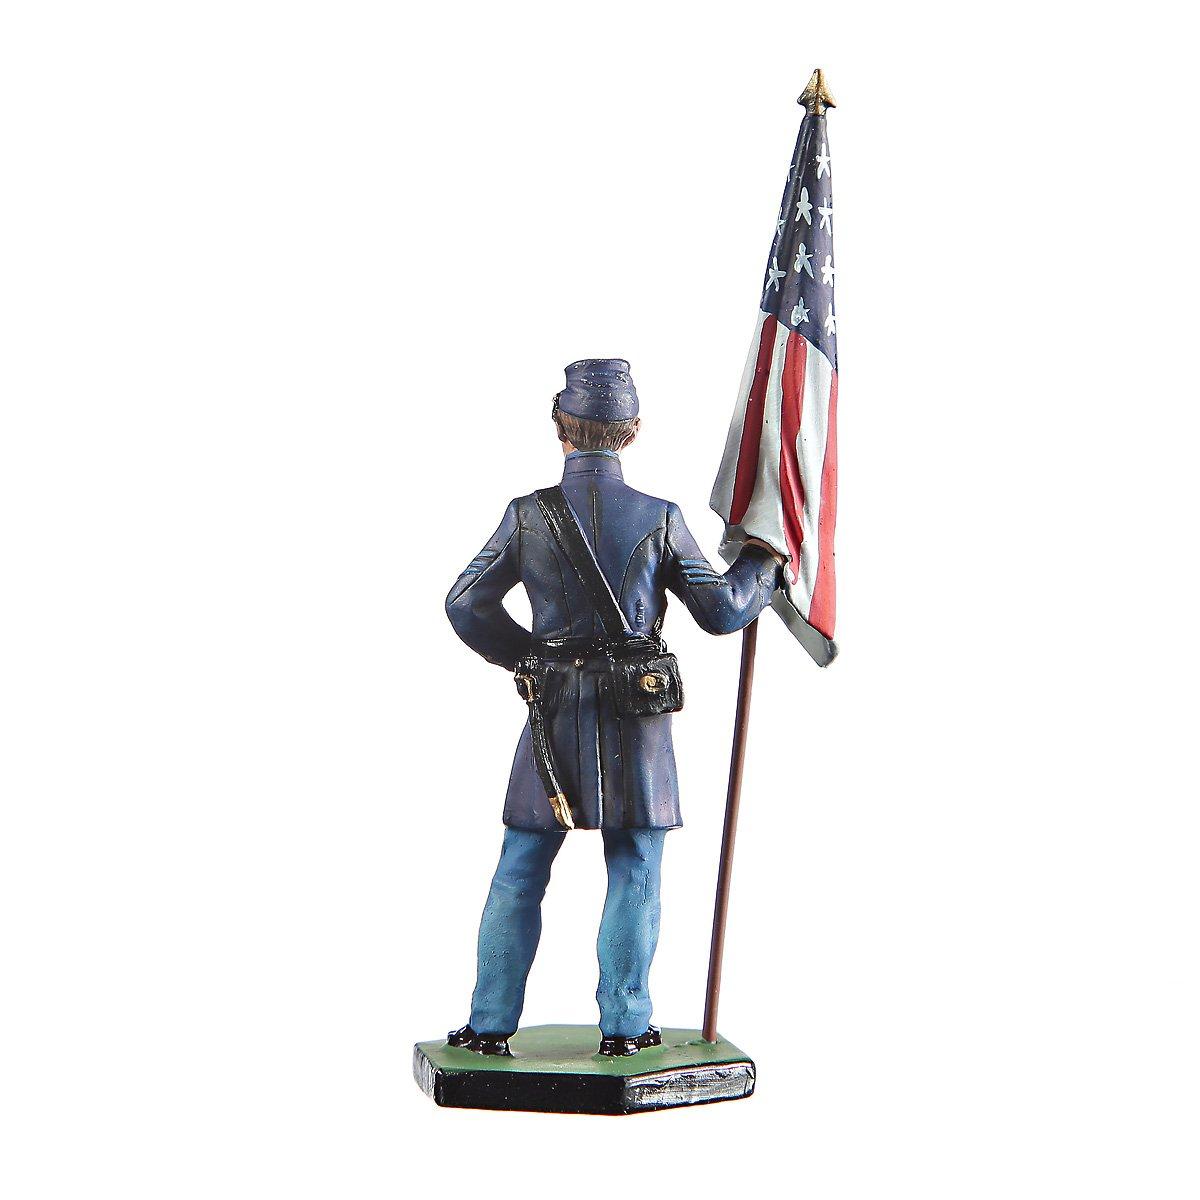 danila-souvenirs Tin Toy Soldier USA Civil war Northerners Standard Bearer Hand Painted Metal Sculpture Miniature Figurine 54mm #CW02 danila2k2